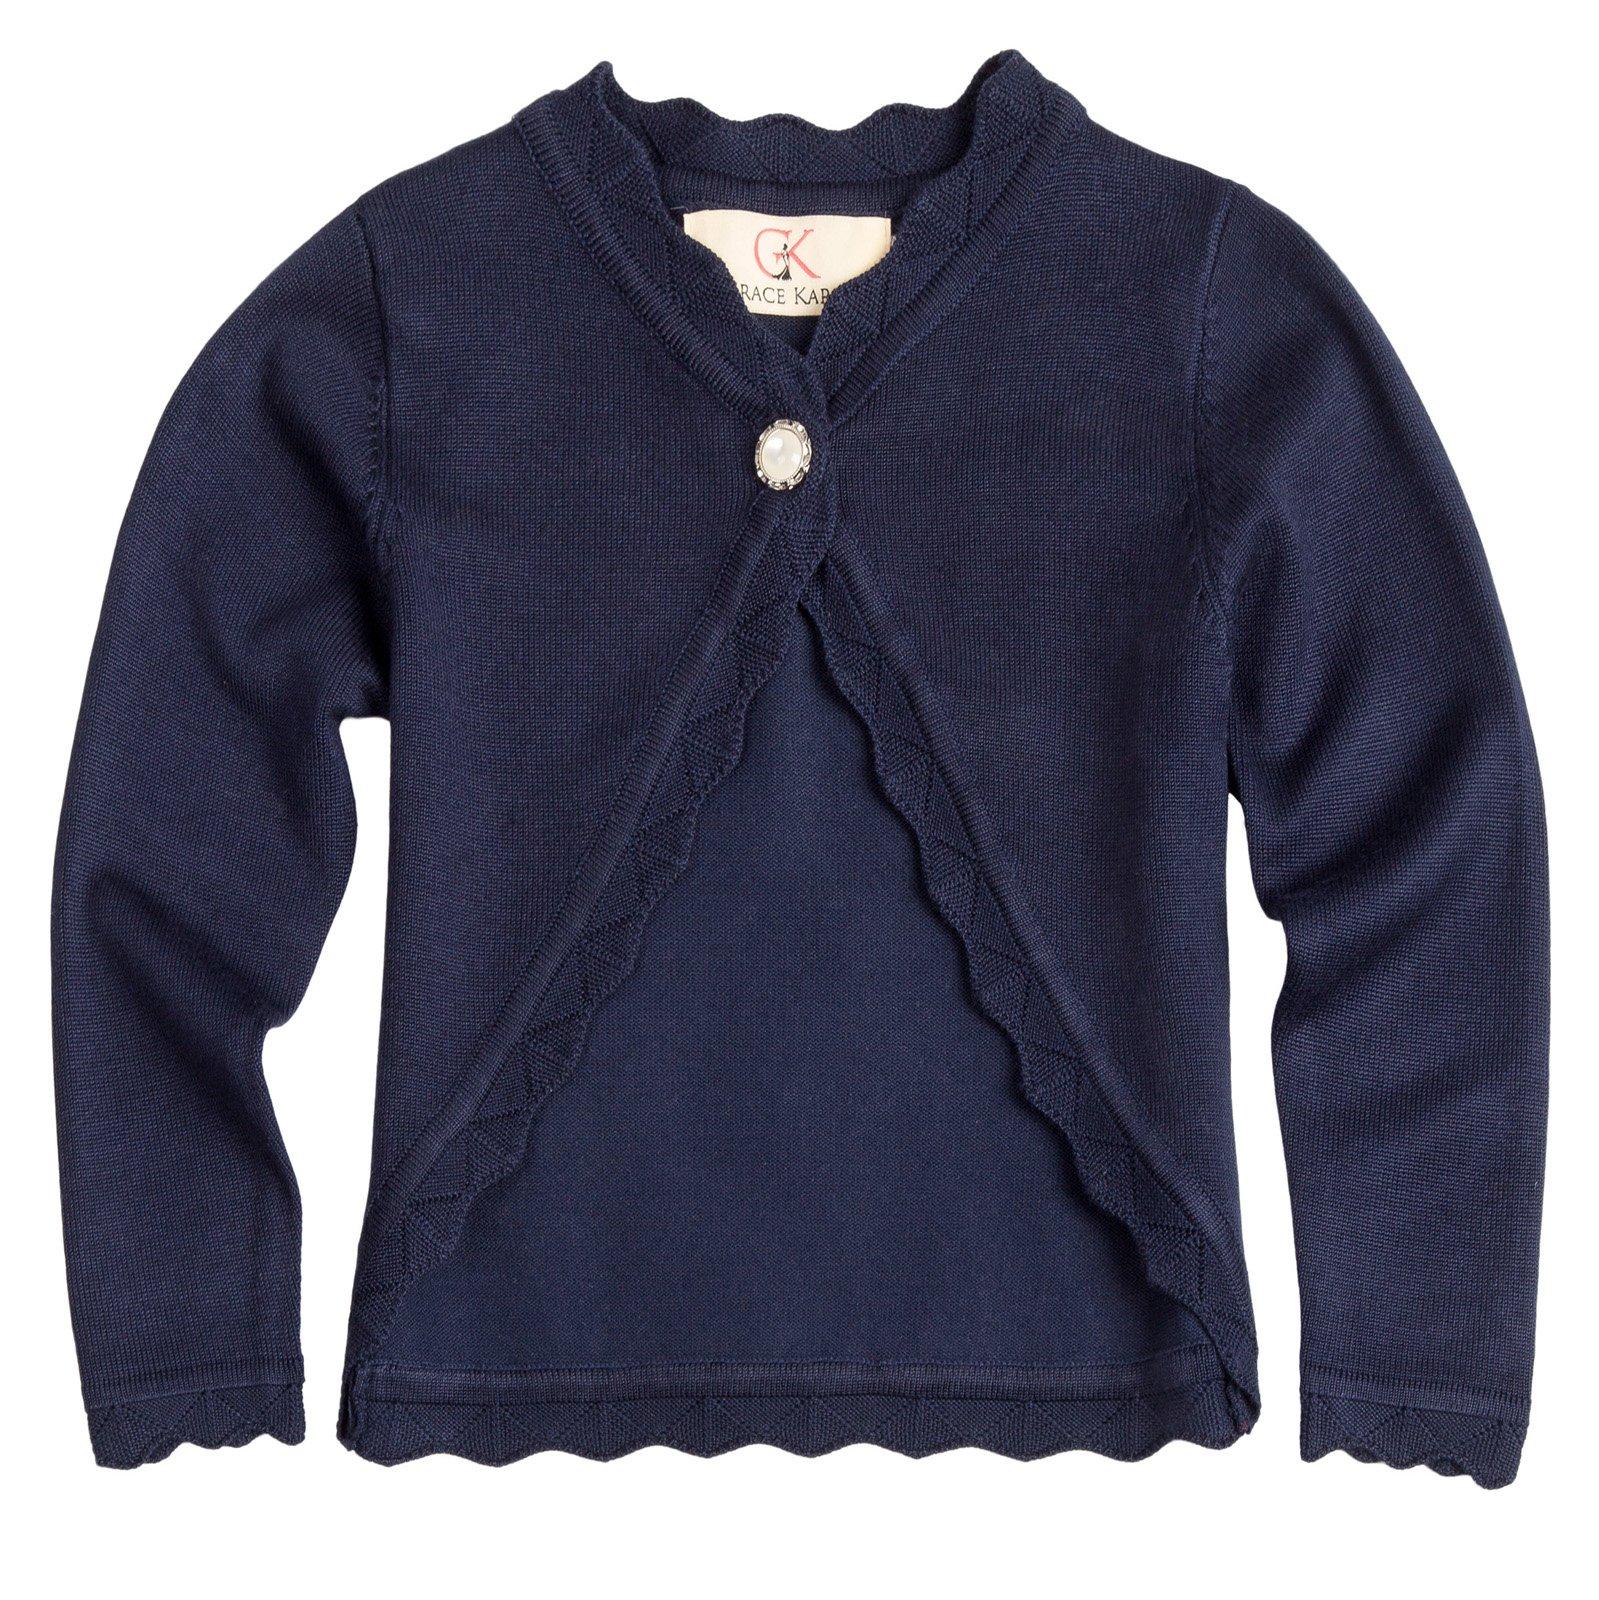 Girls Cotton Coat Long Sleeve Lace Shawl 6-7yrs AM1019-2